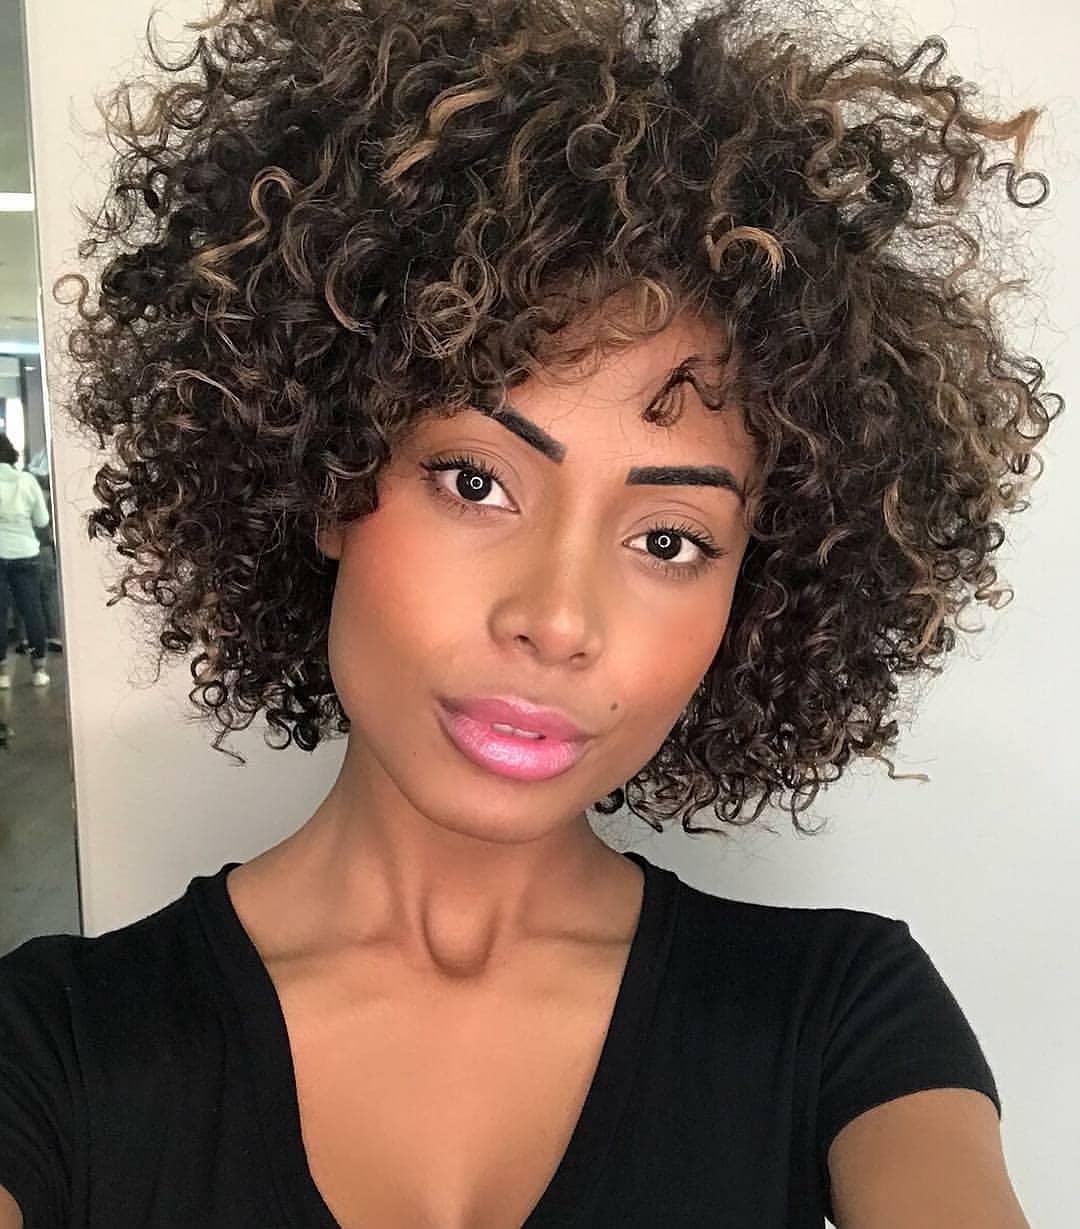 Завивка на короткие и средние волосы фото 19